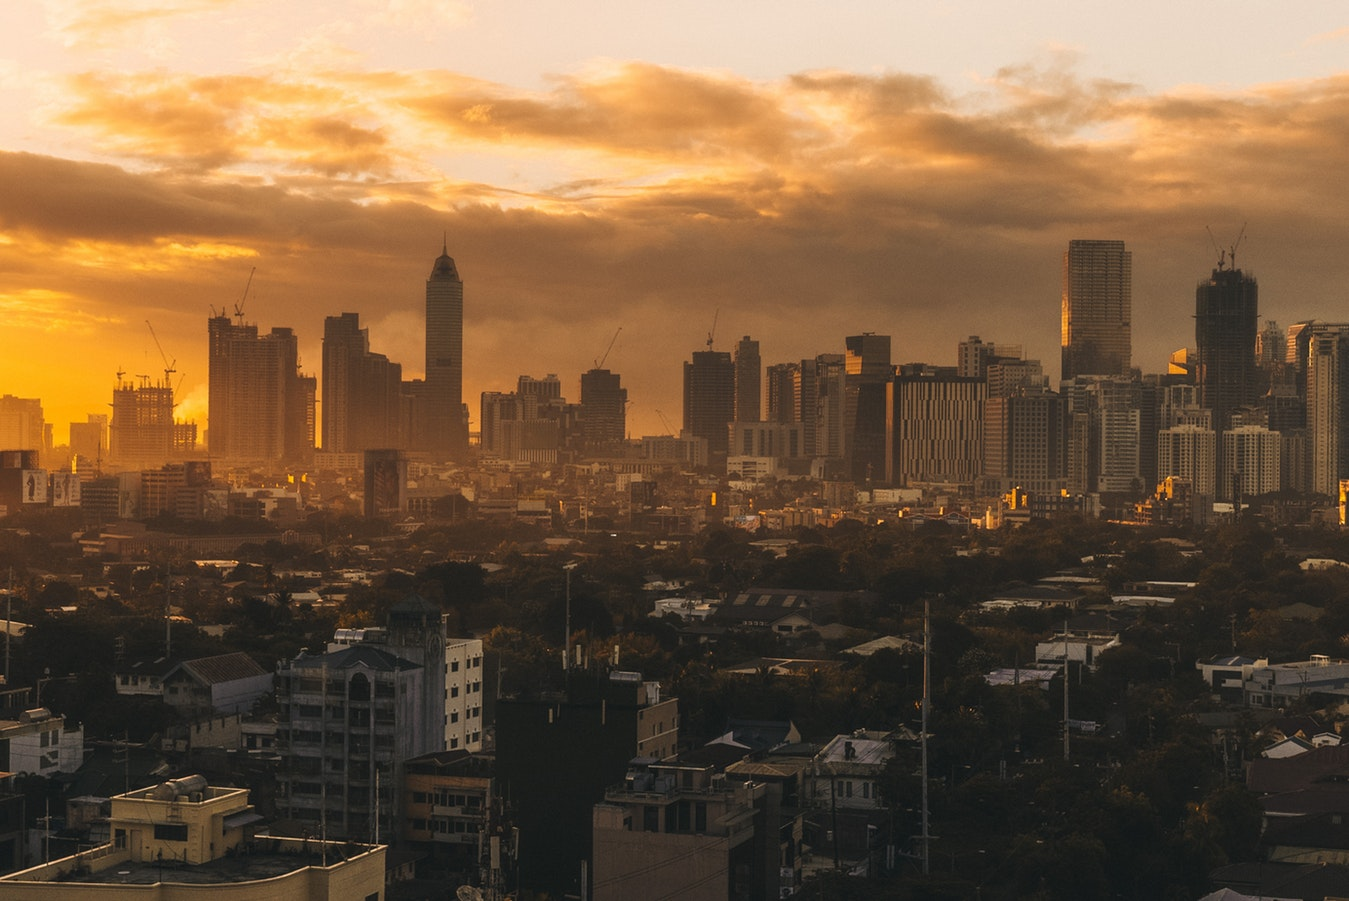 sunset over manila